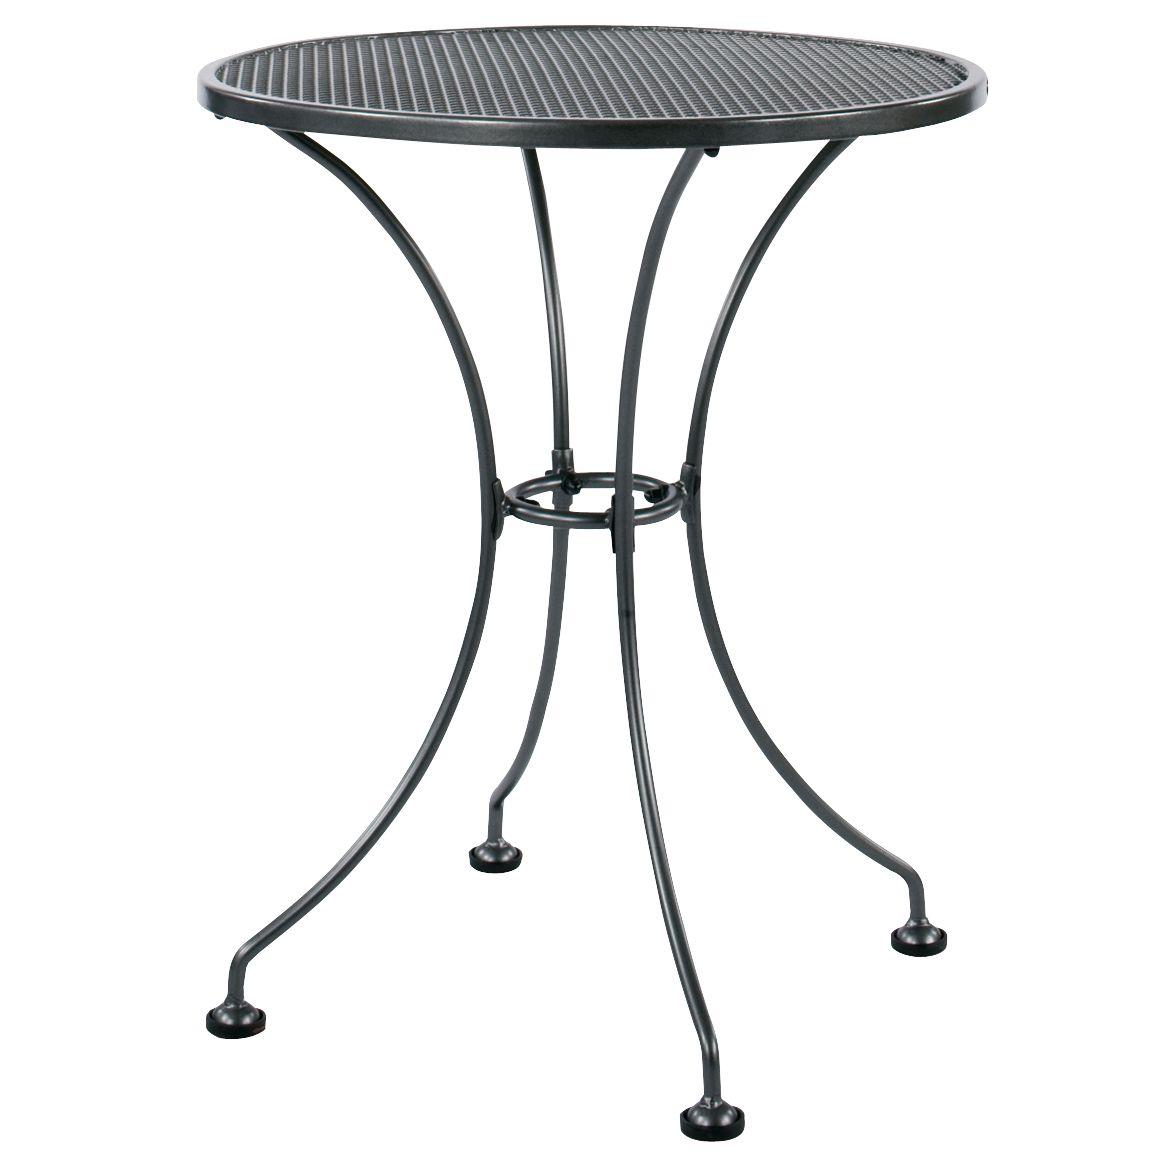 Royal Garden Elegance Bistro Outdoor Table